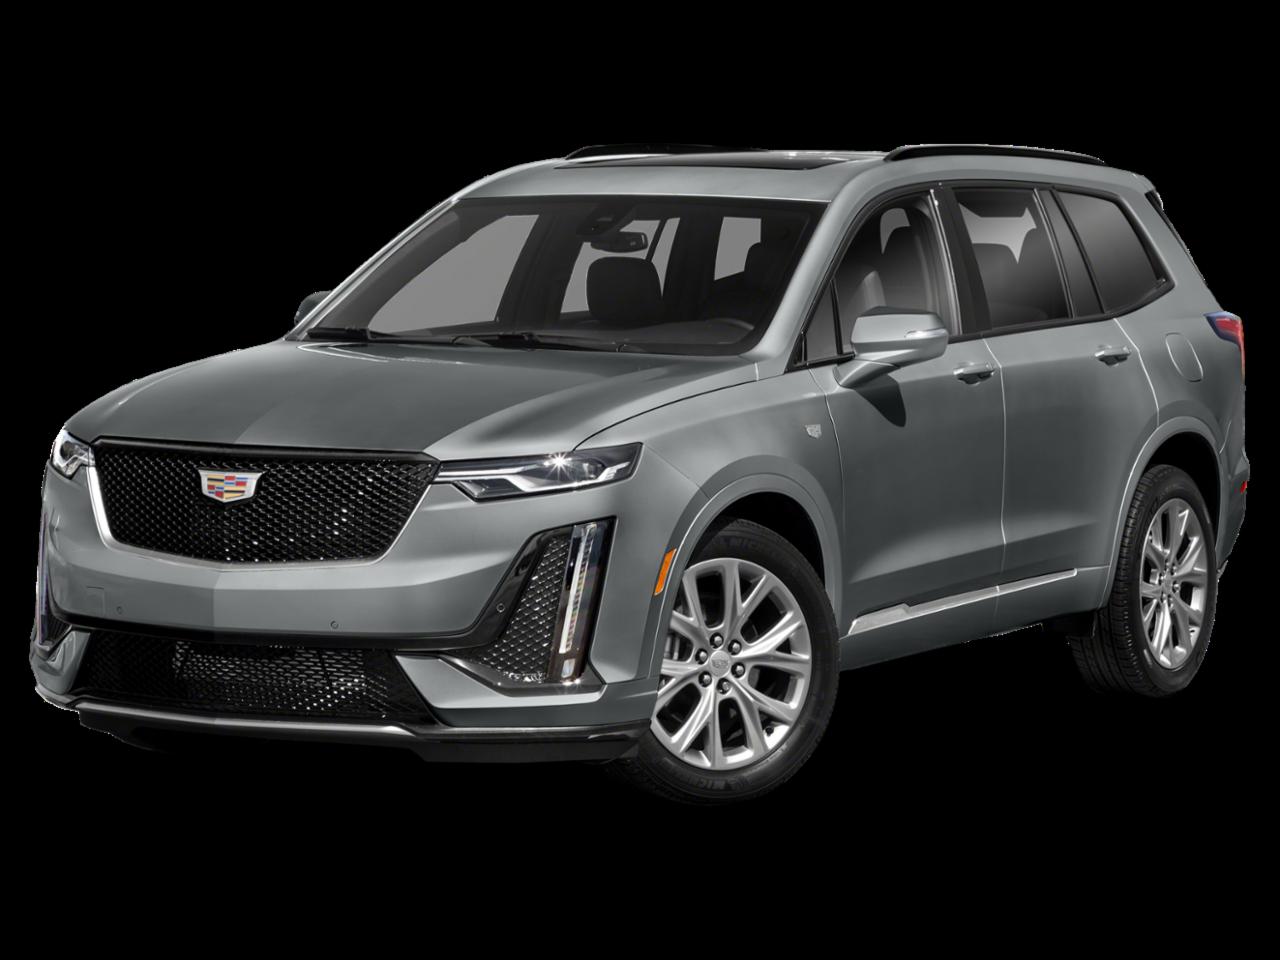 "2020 Cadillac<br/><span class=""vdp-trim"">XT6 AWD Premium Luxury AWD Sport Utility</span>"